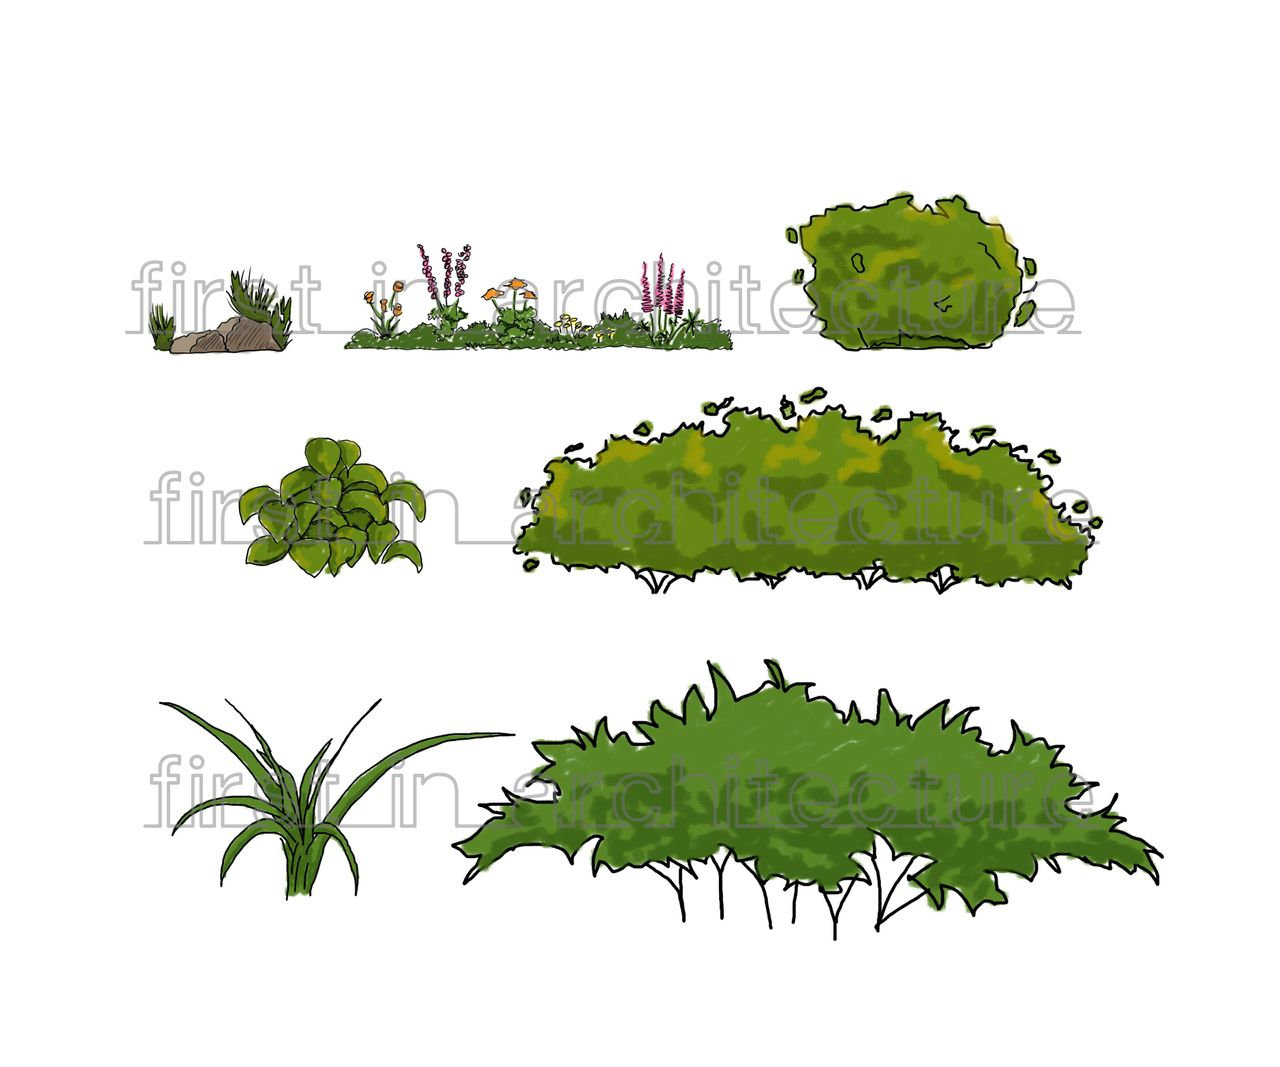 Sketch Up Components - Sketchy Plants